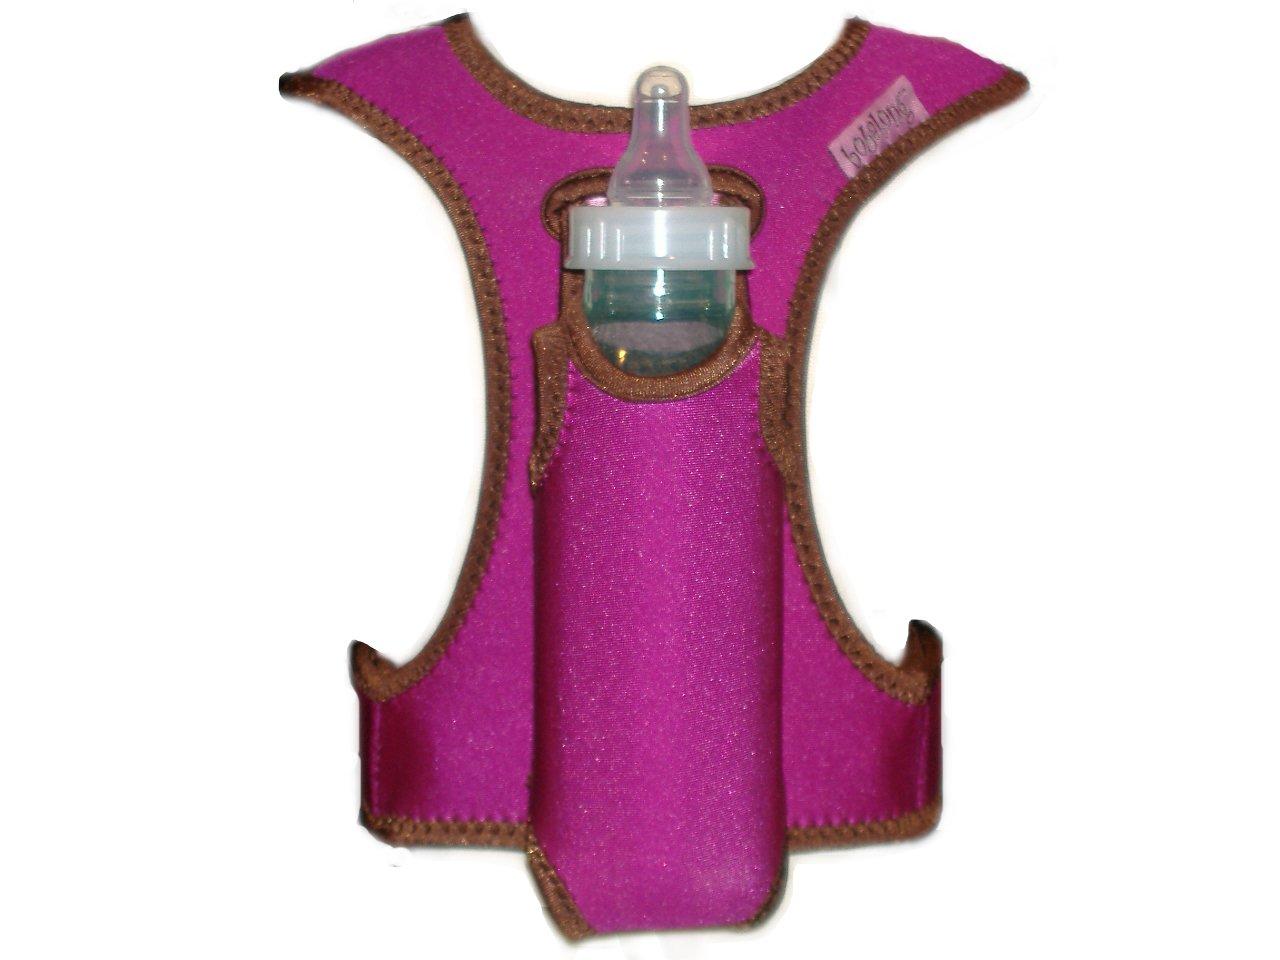 bobalong Bottle Holder, Magenta/Chocolate by bobalong